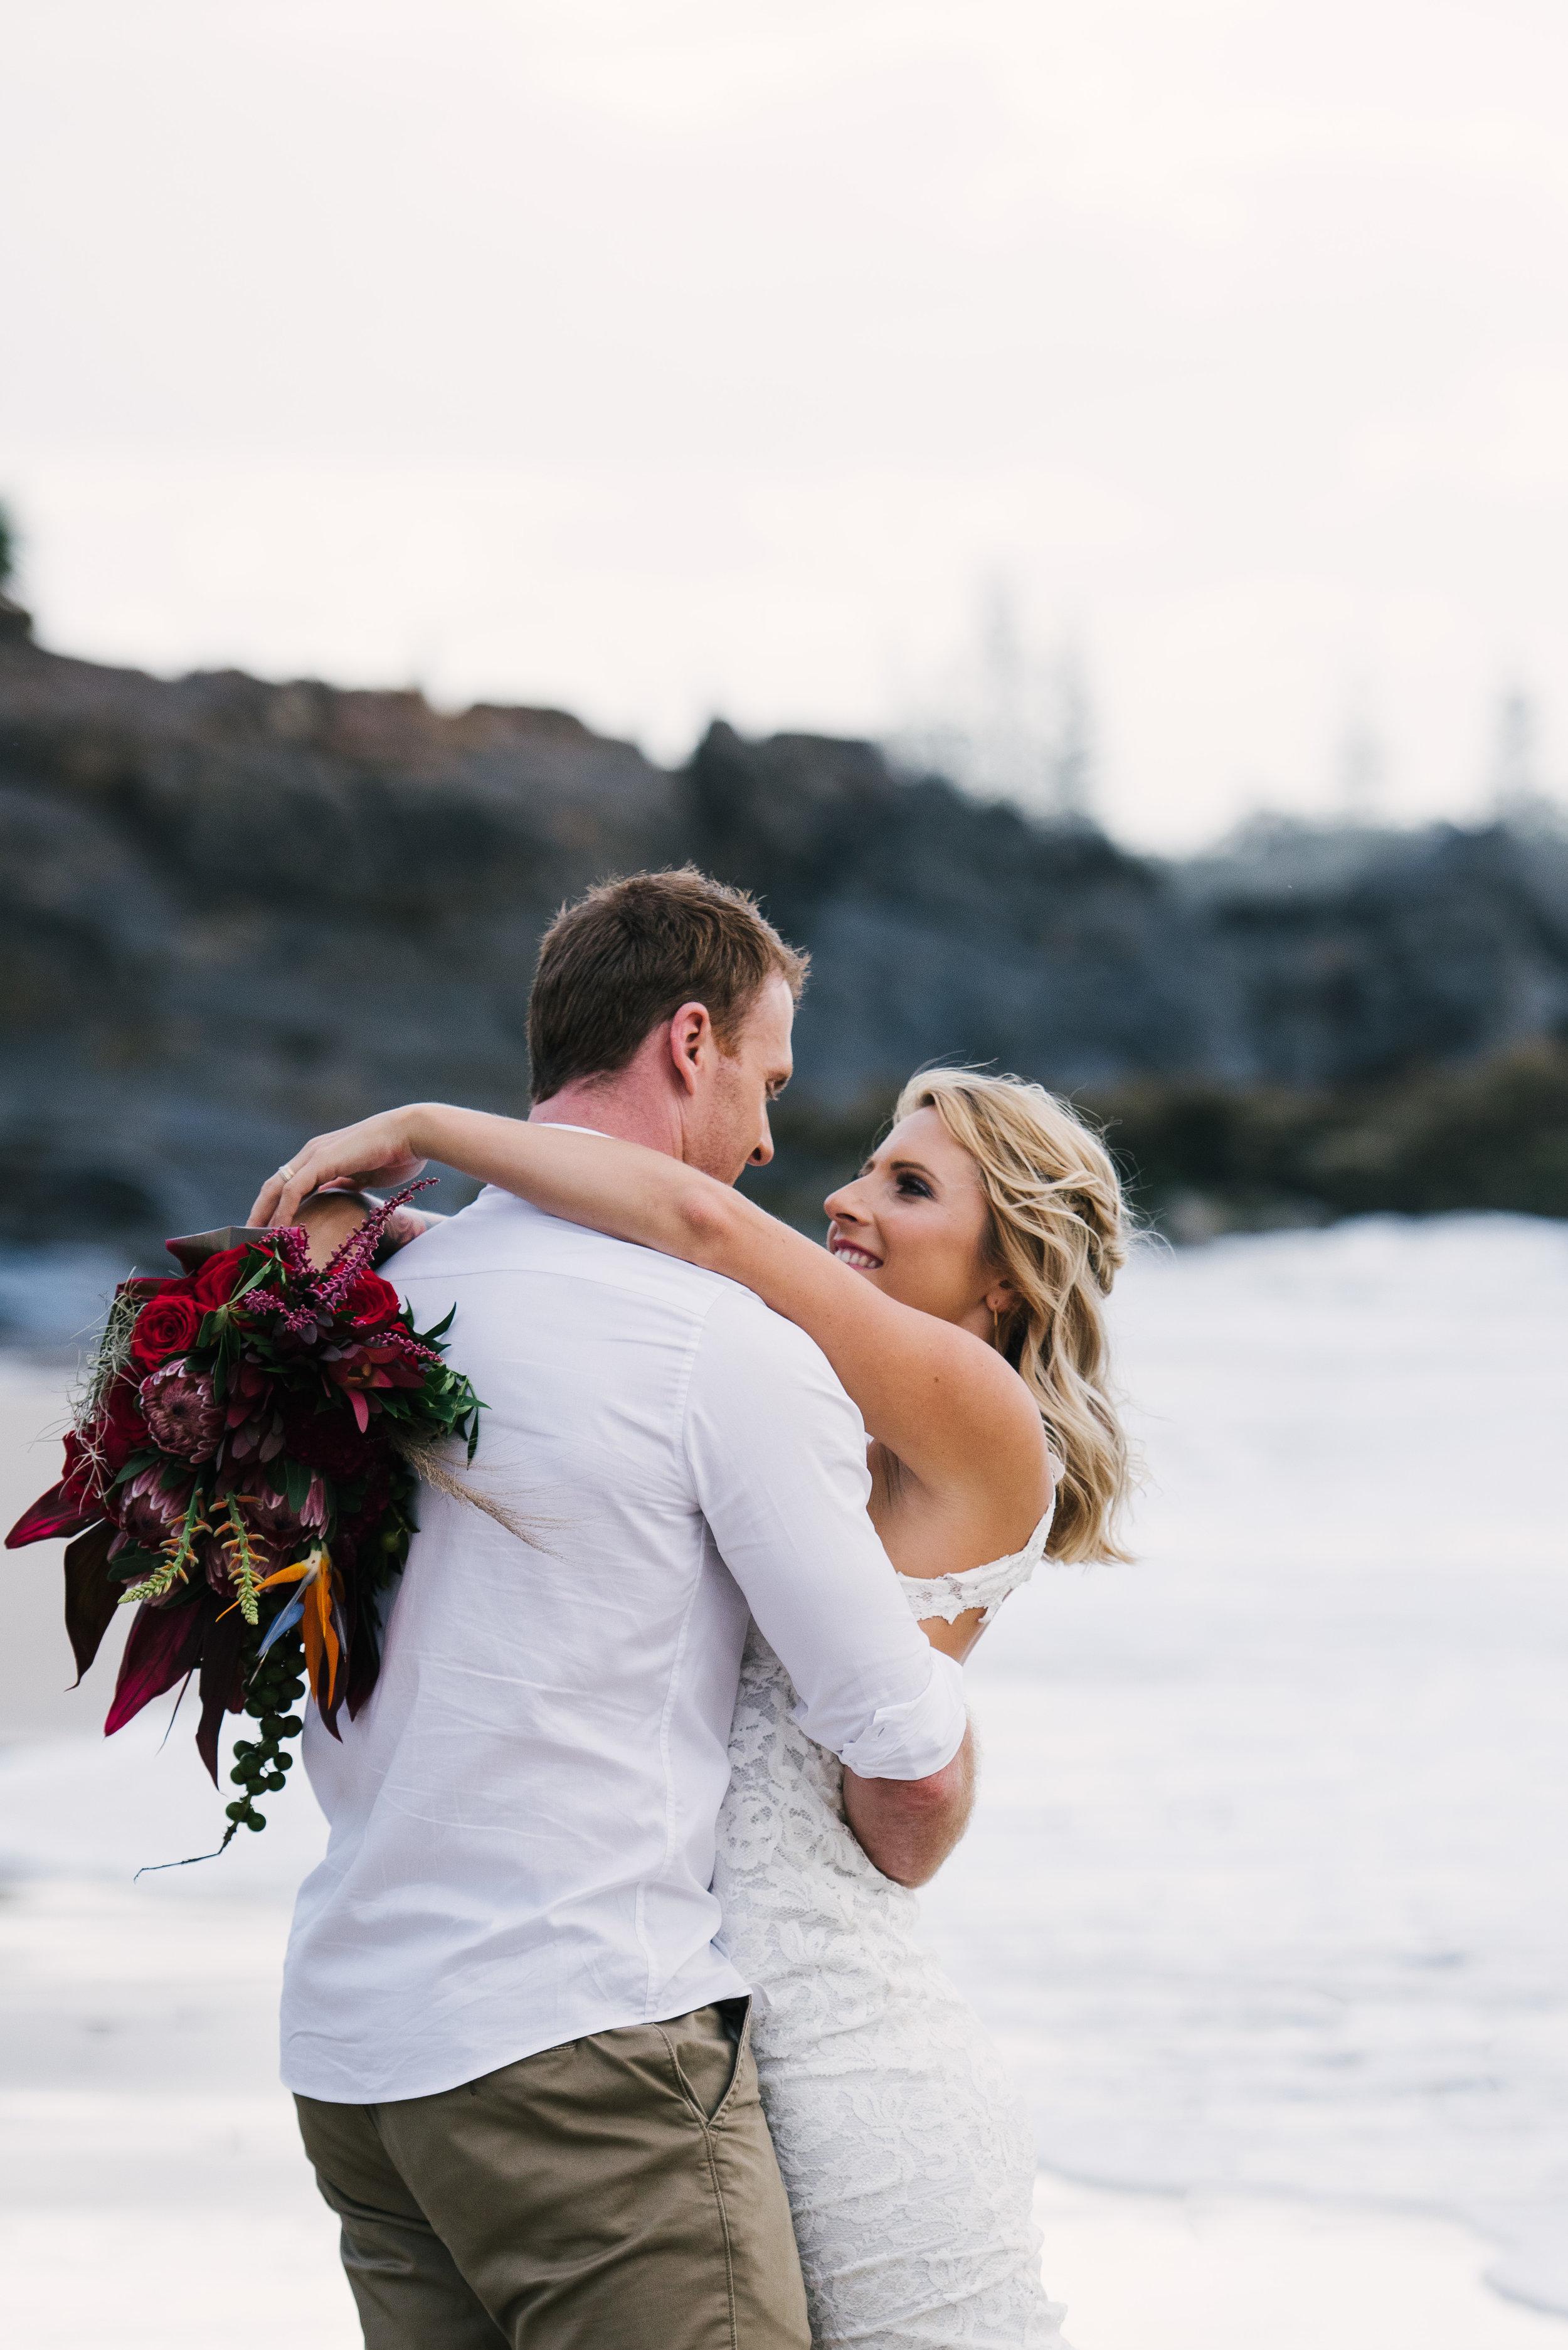 Jess and Darren- wedding photographer, byron bay wedding and family photographer, tweed heads wedding and family photography-174.jpg